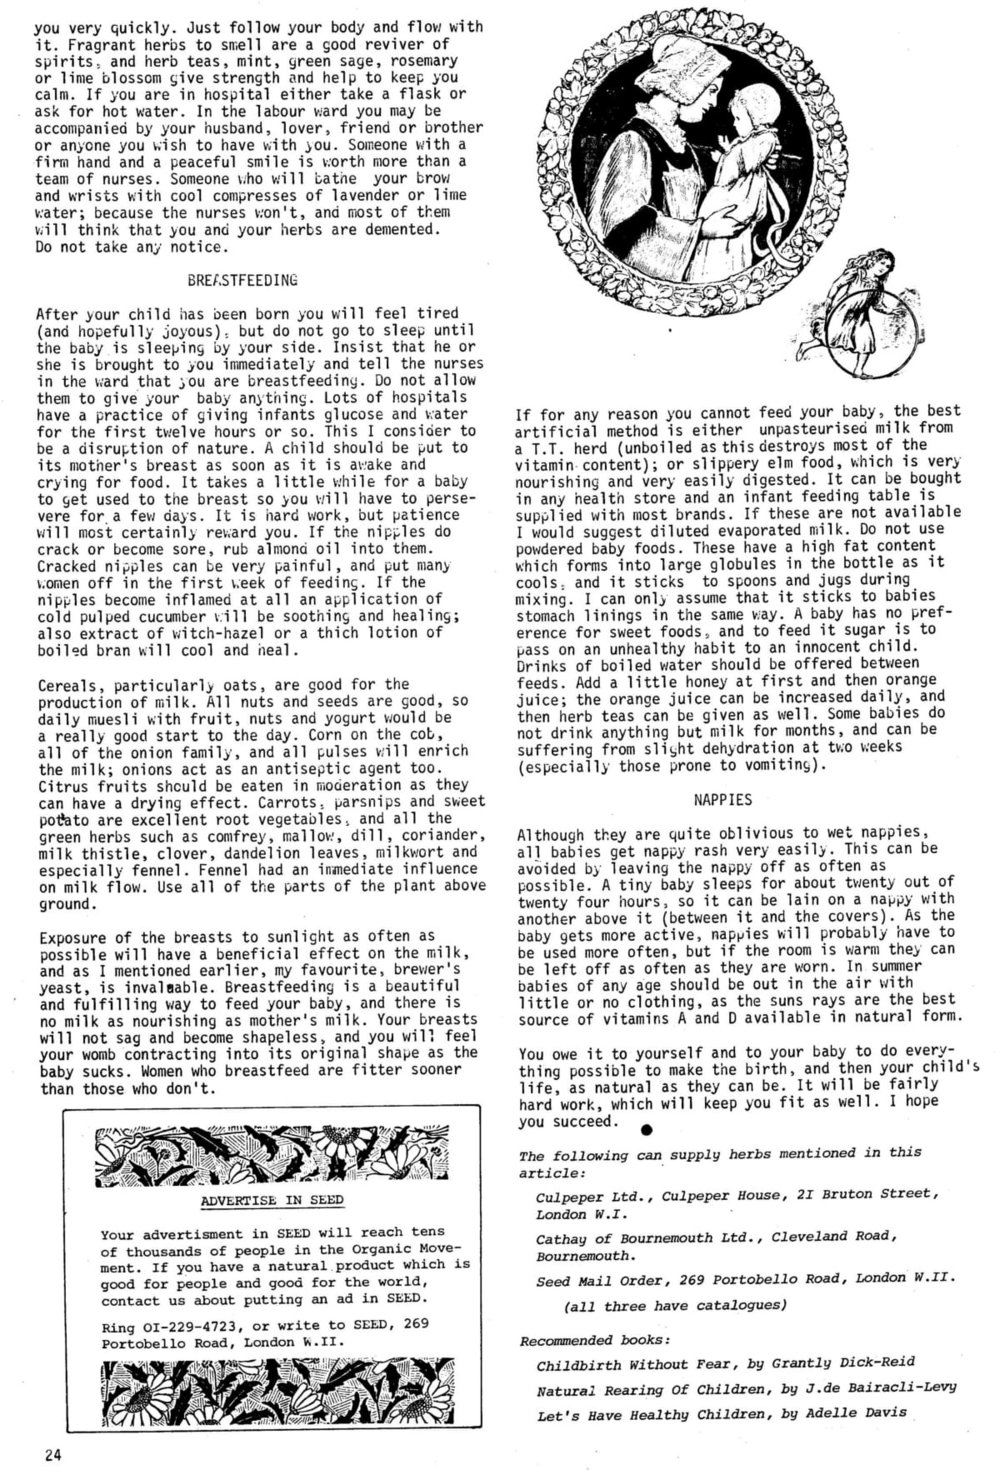 seed-v3-n1-jan1974-24.jpg